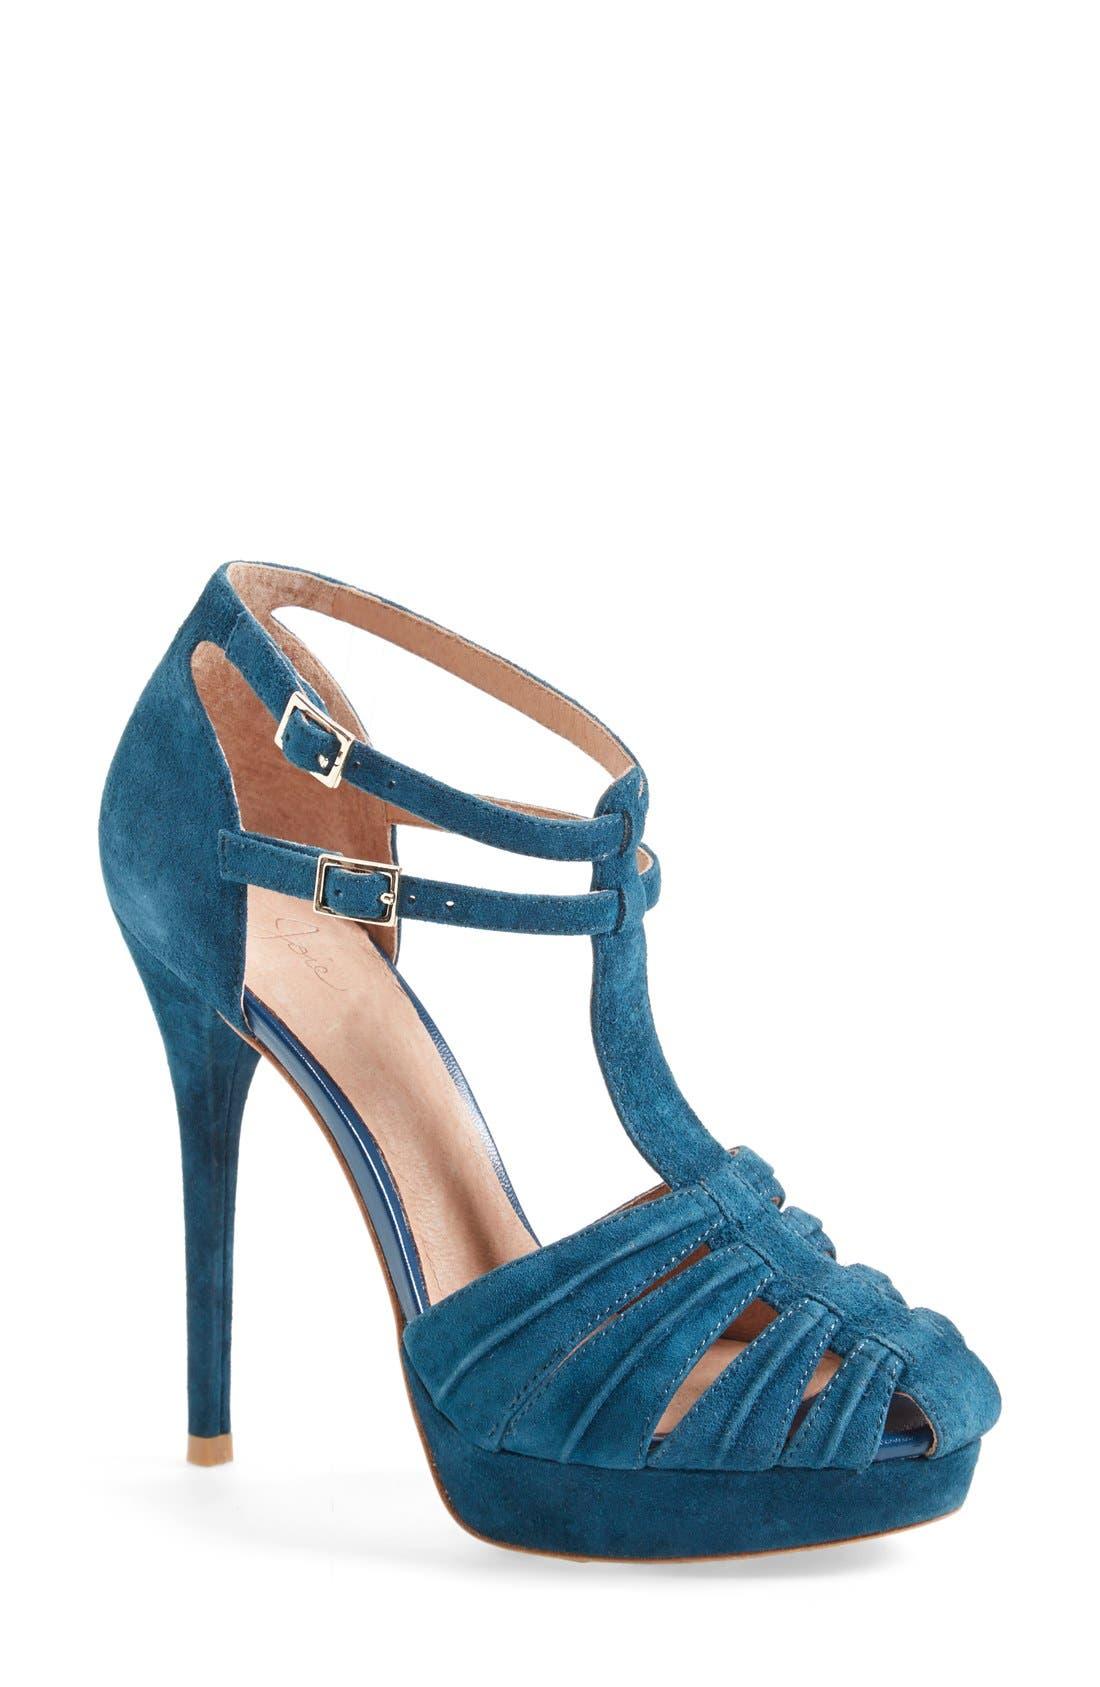 Main Image - Joie 'Rexanne' Platform Sandal (Women)